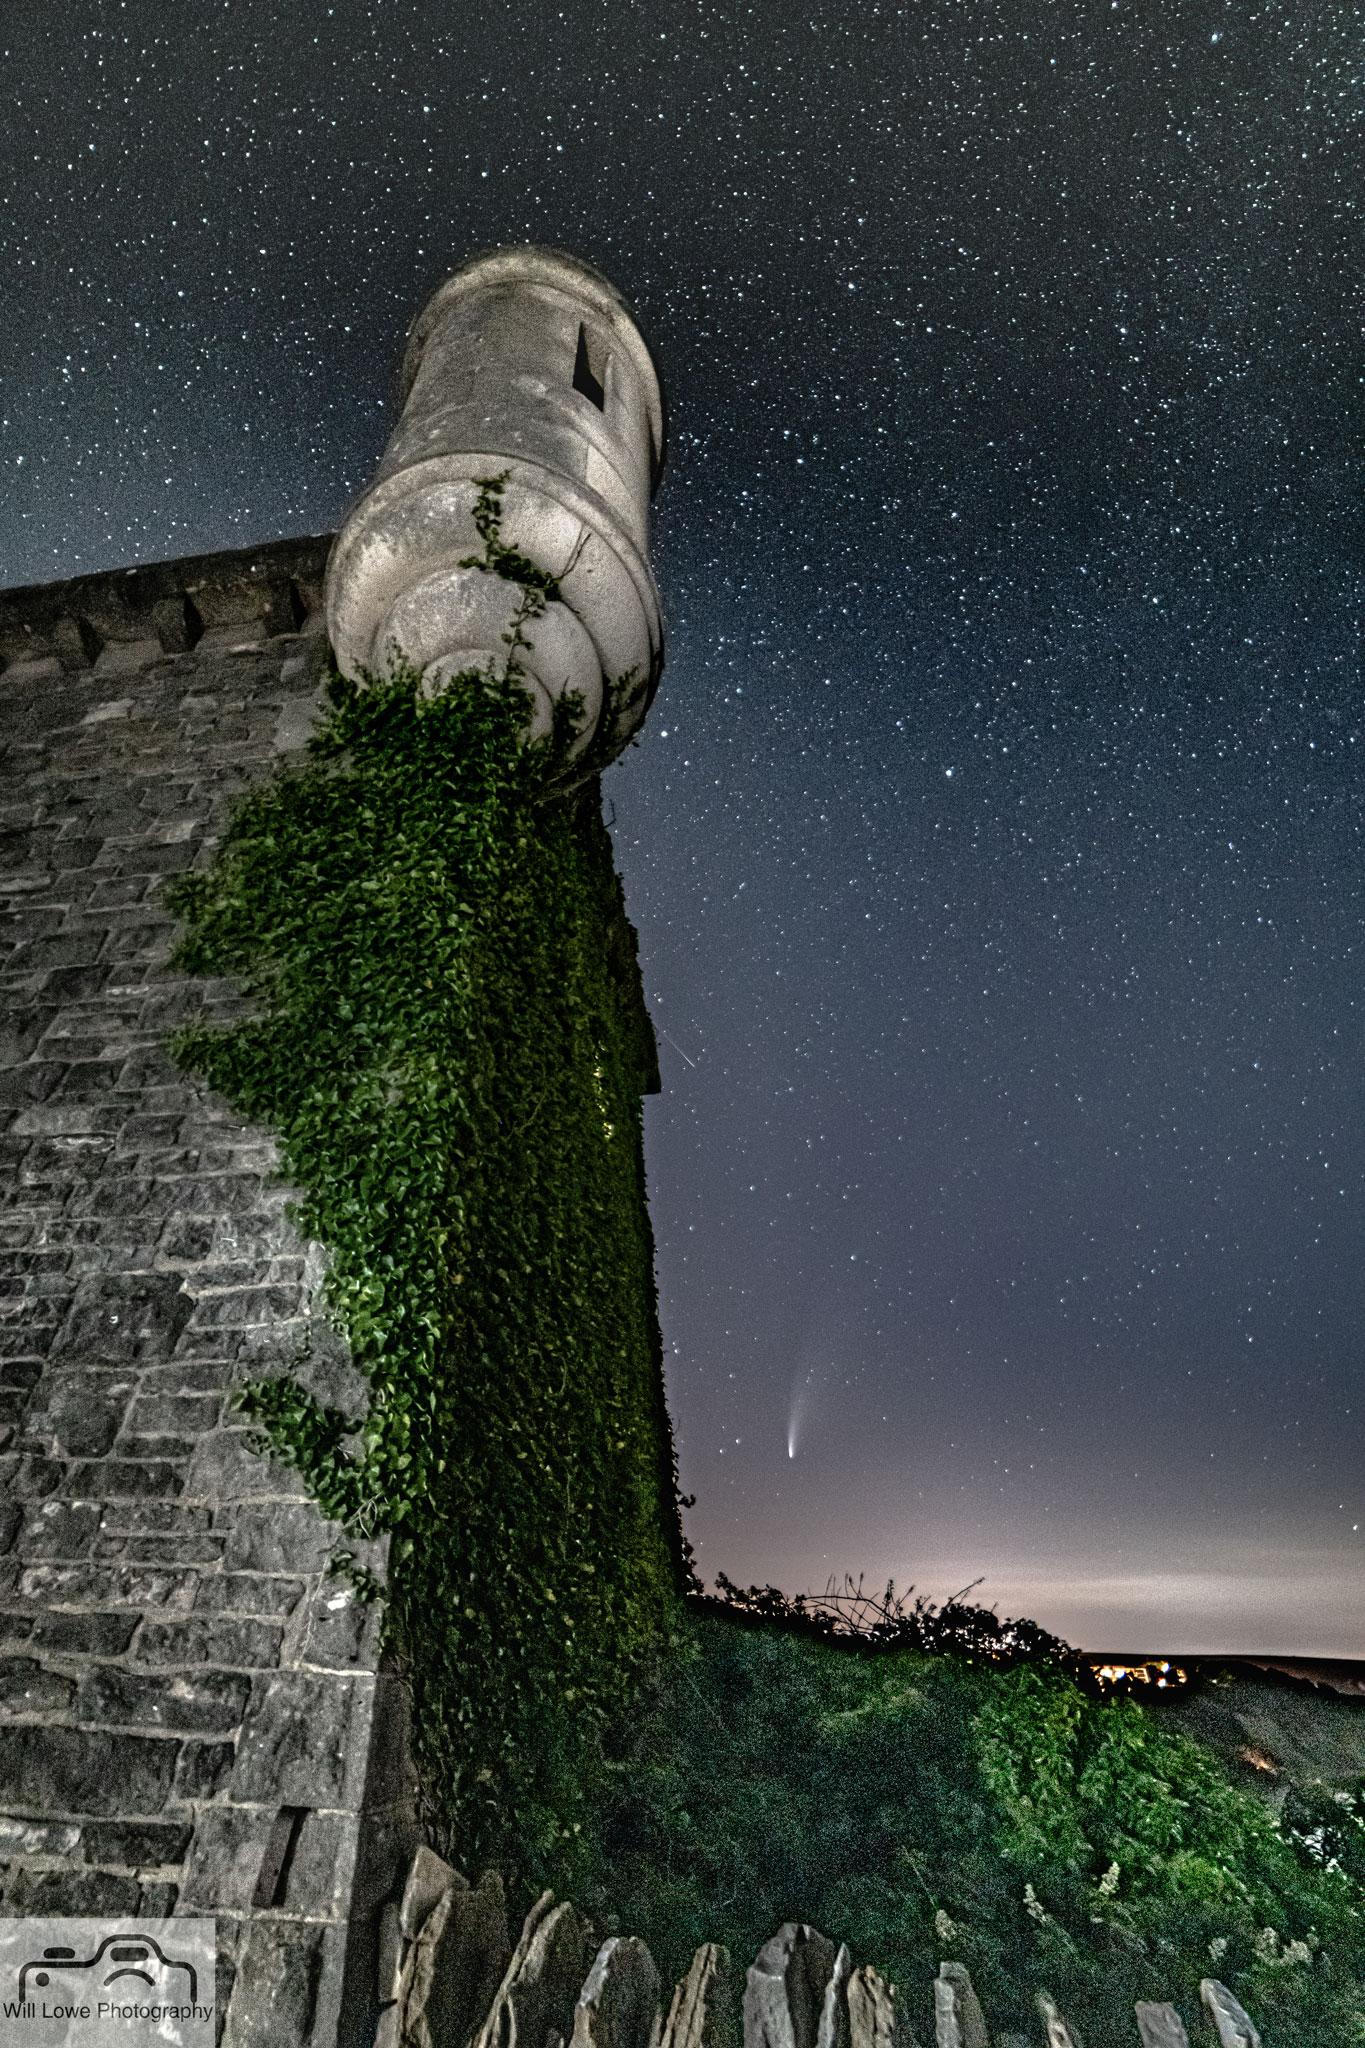 Neowise Comet over Durlstan Castle